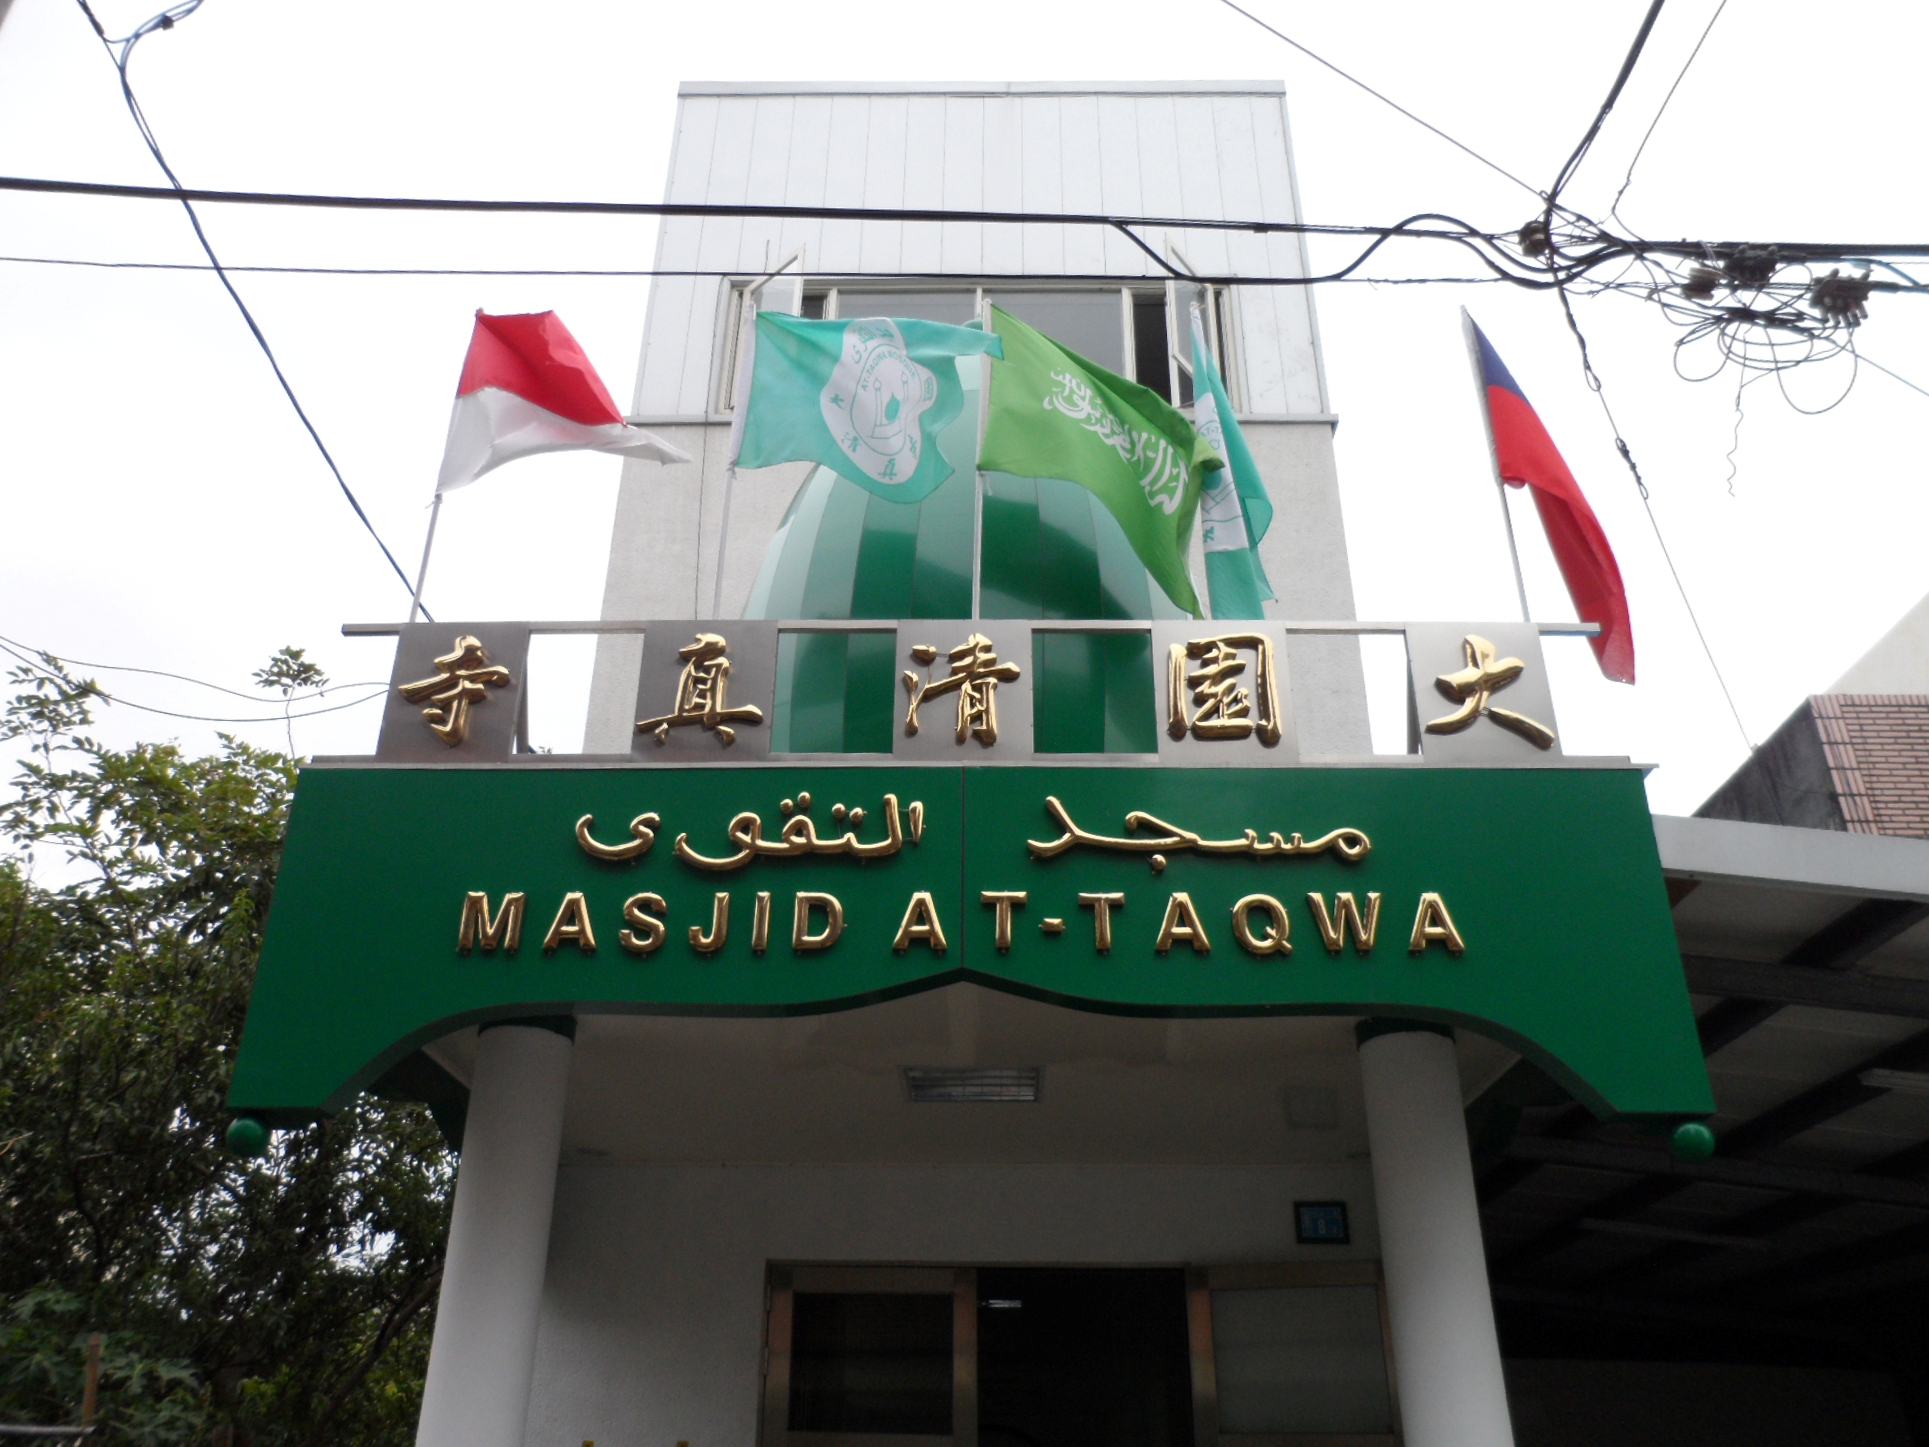 Taqwa - Wikipedia